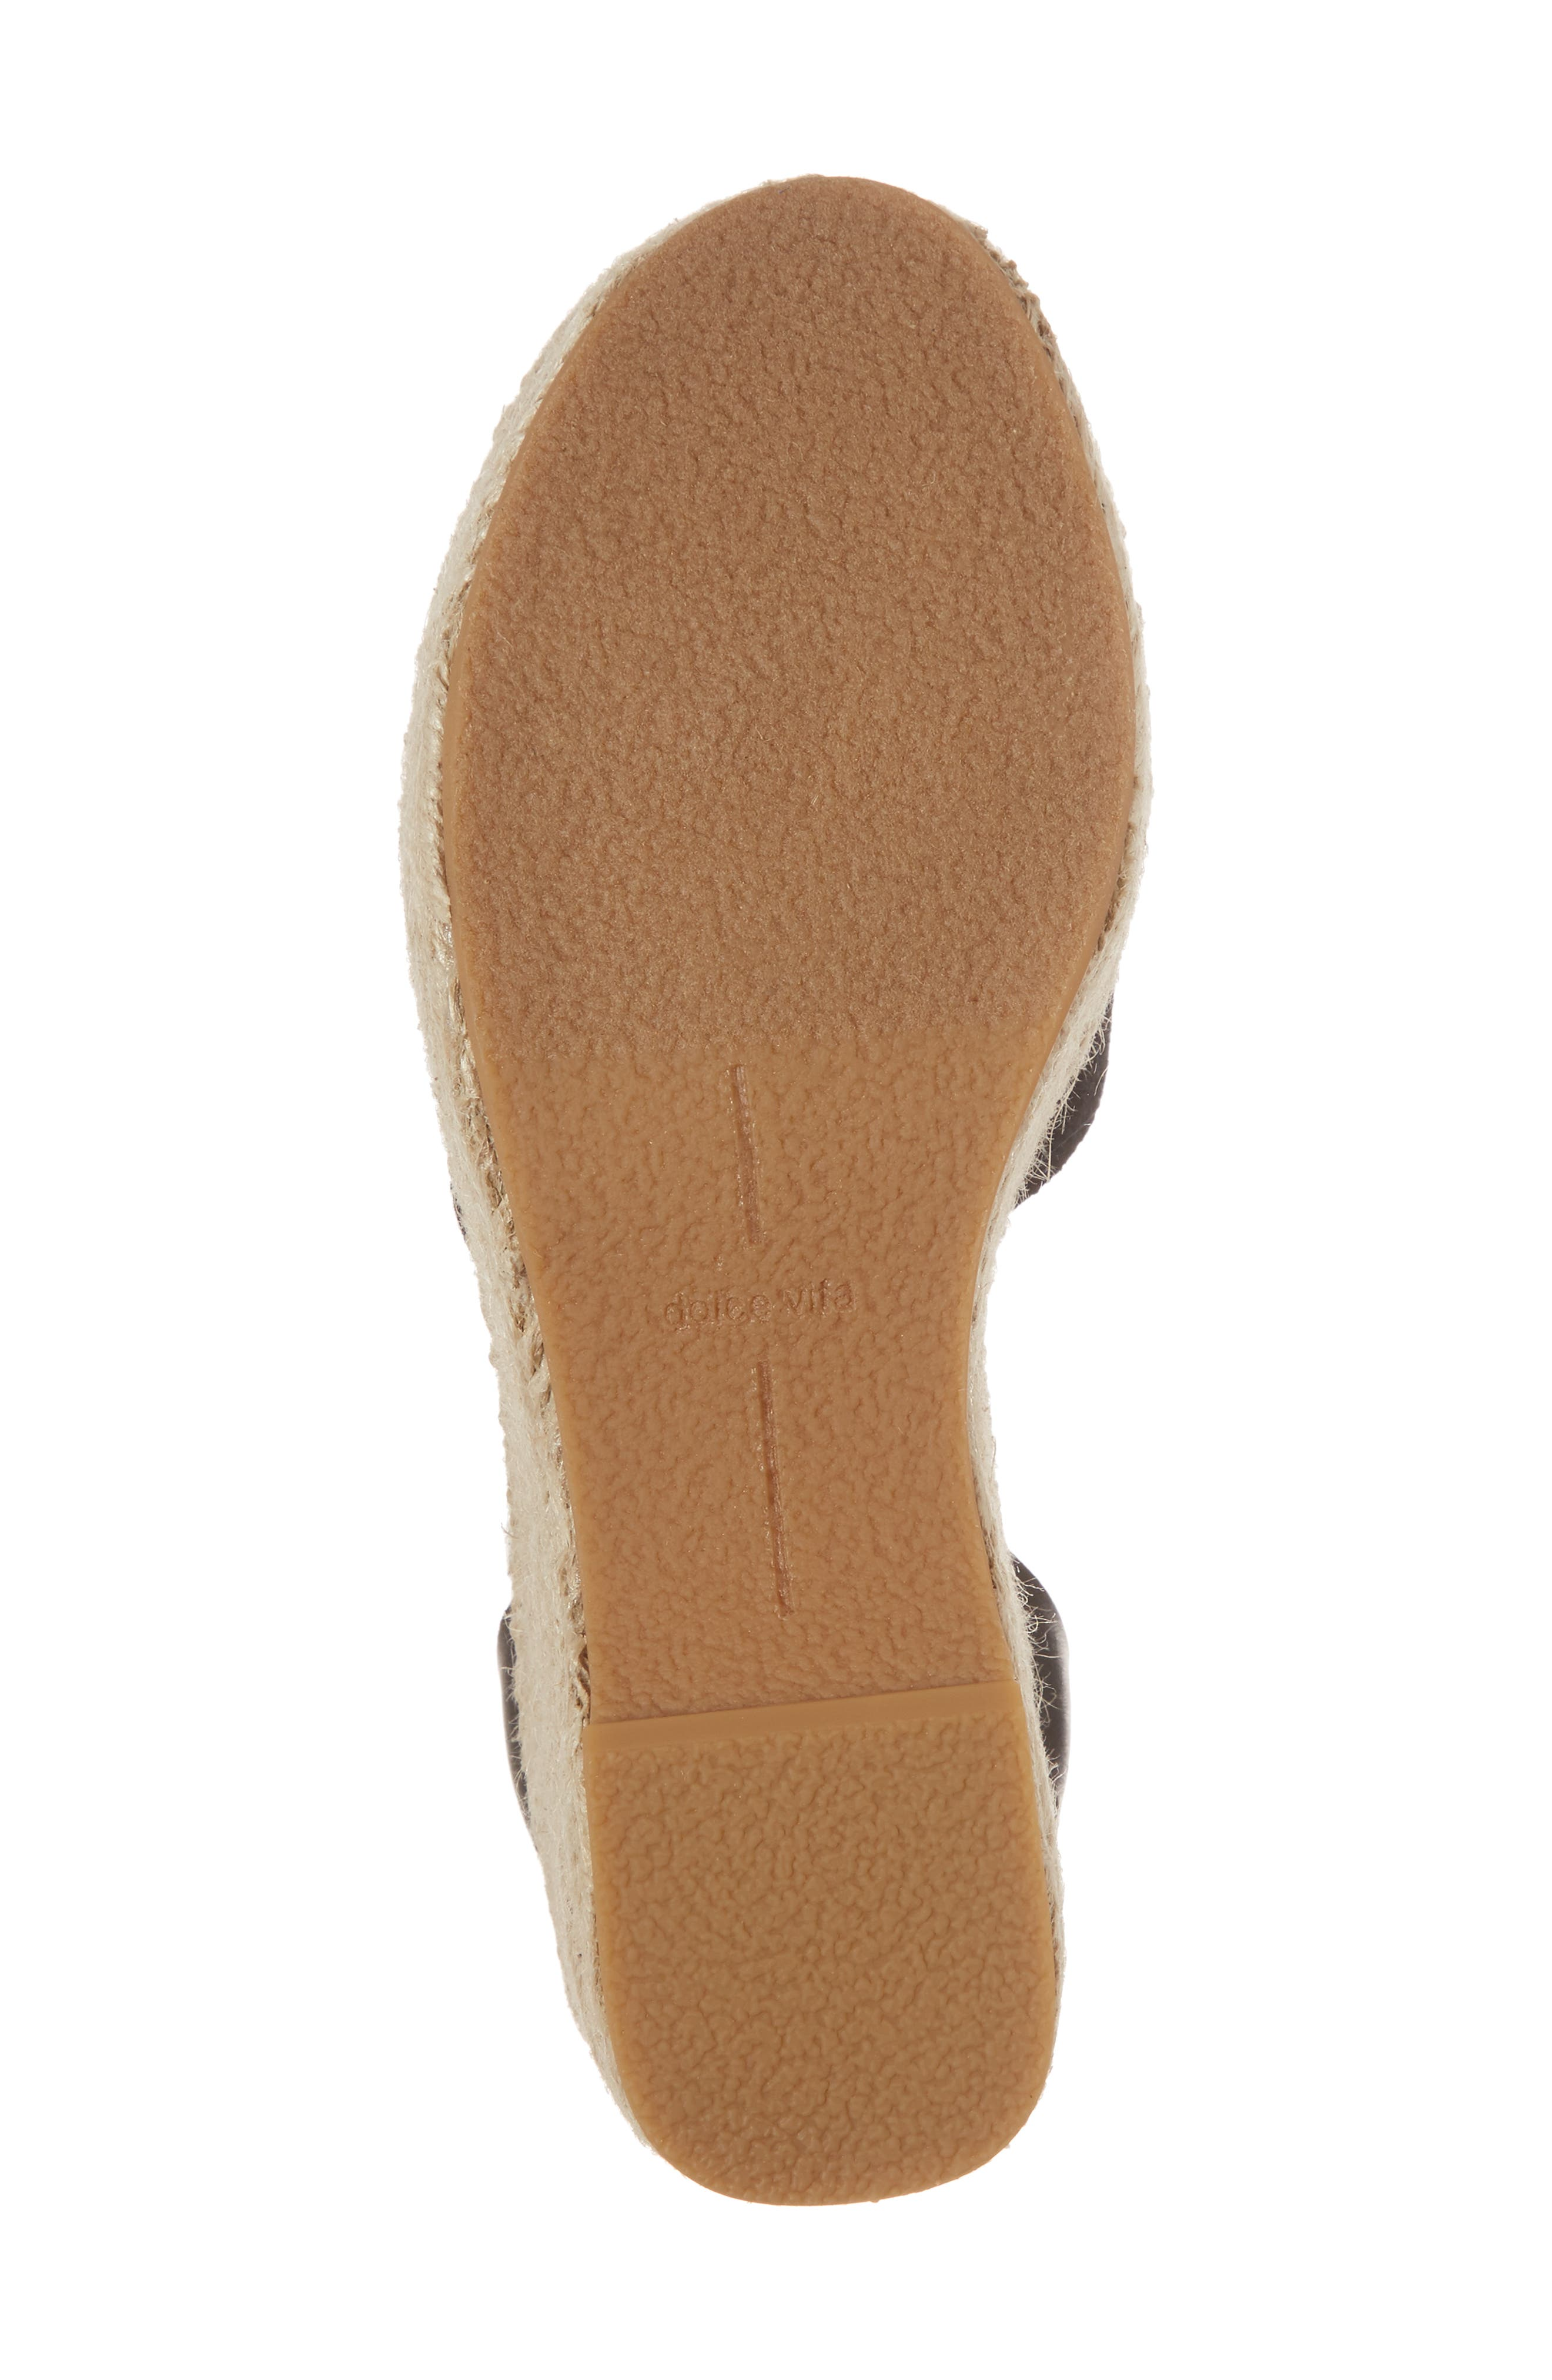 DOLCE VITA, Lesly Espadrille Platform Sandal, Alternate thumbnail 6, color, 001